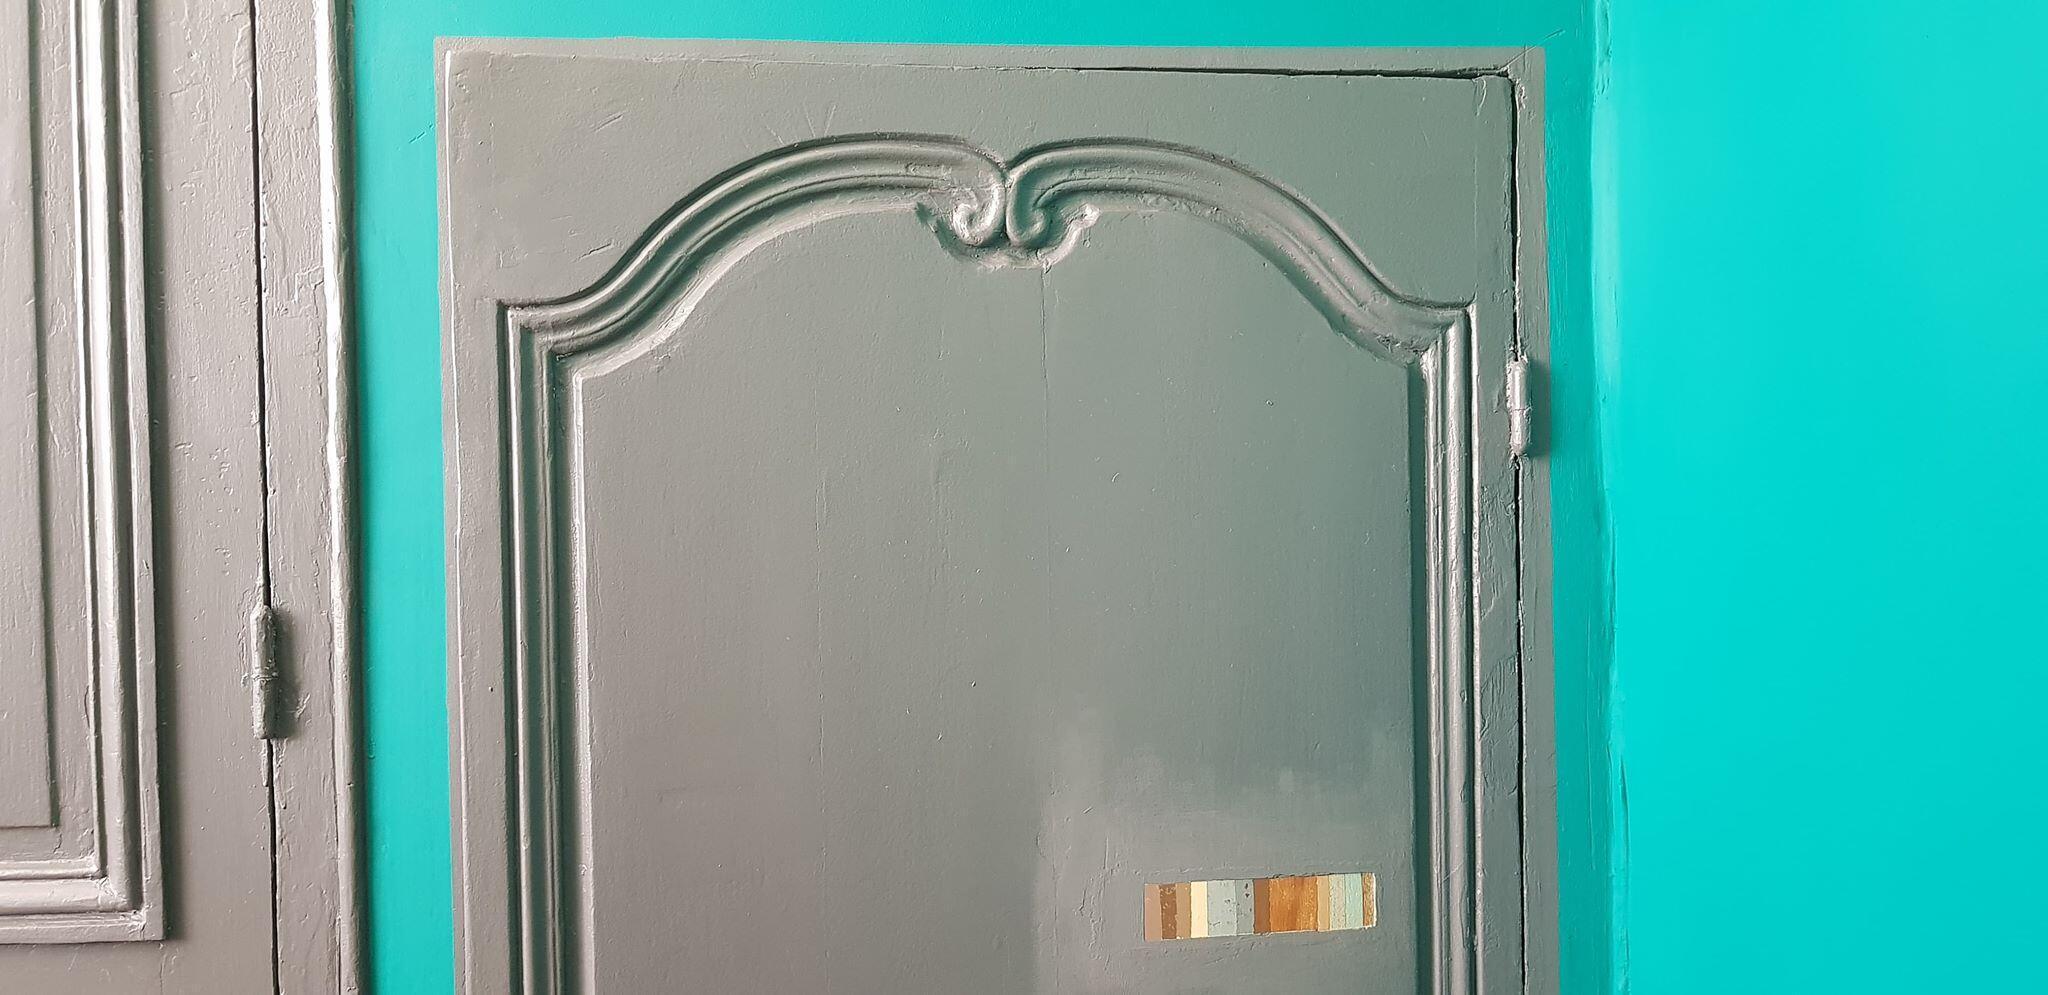 Самая старая дверь в доме Бальзака